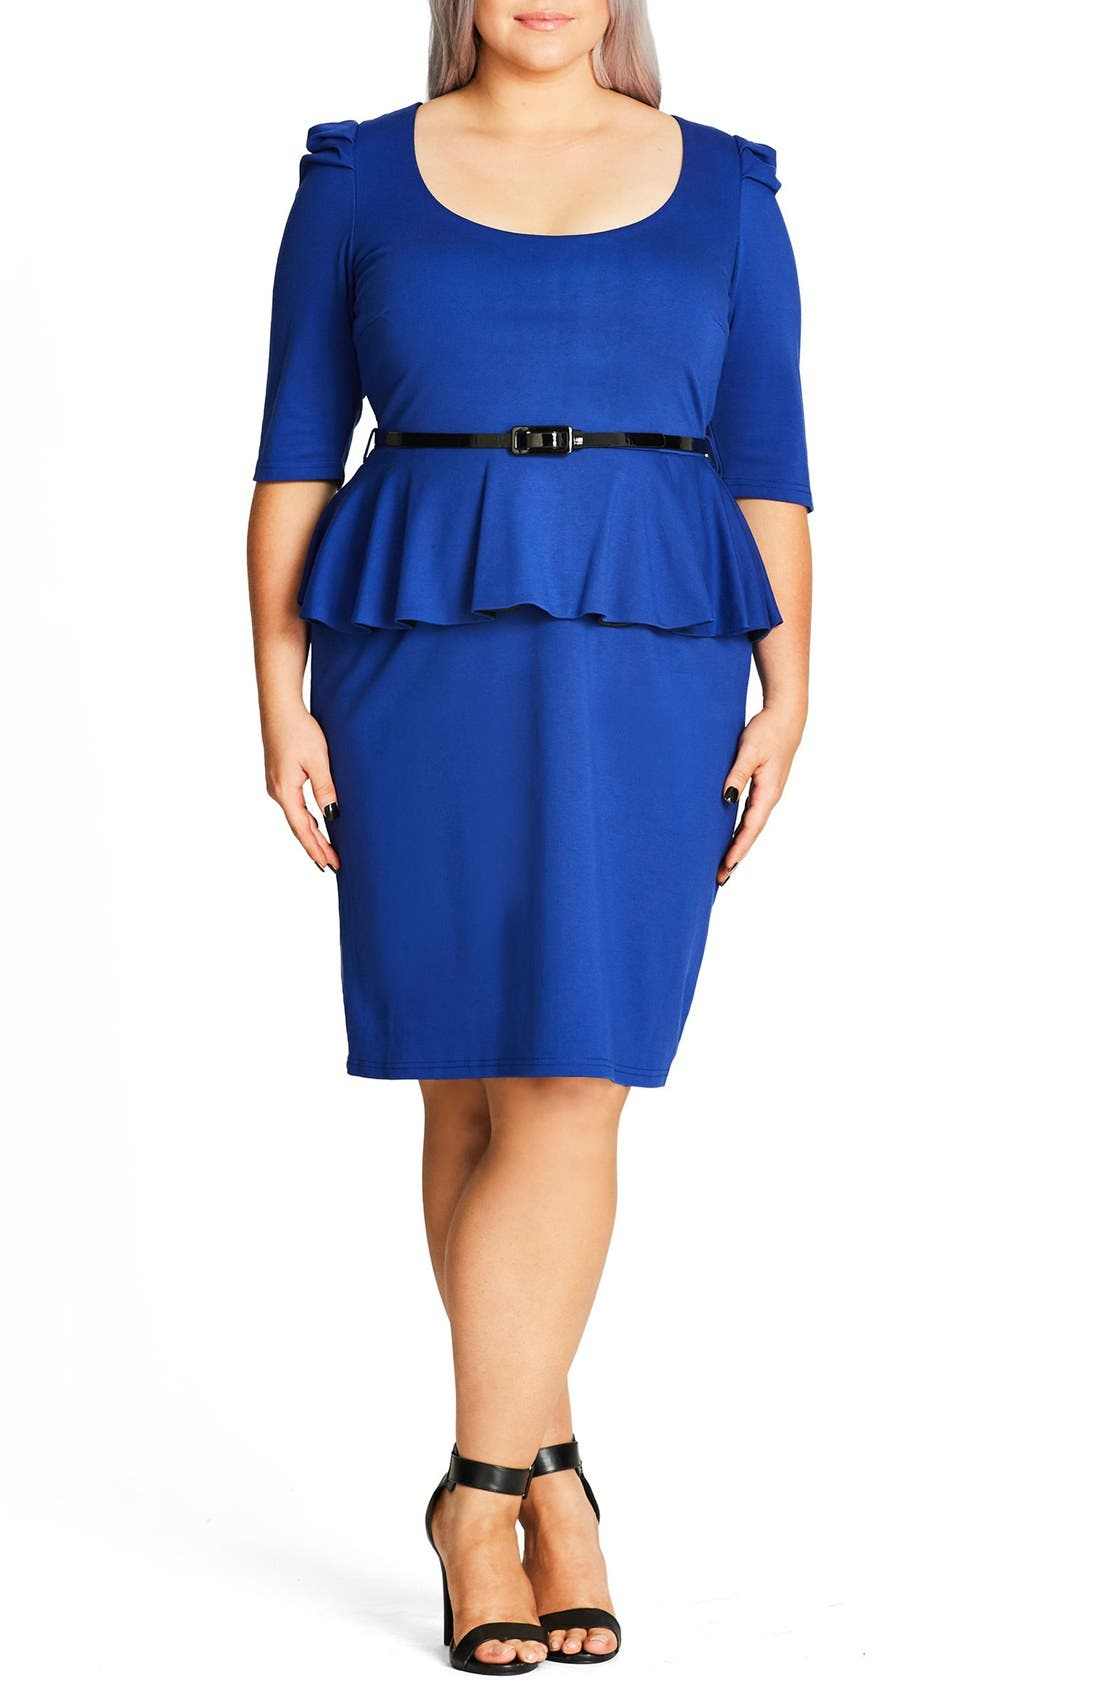 Alternate Image 1 Selected - City Chic Peplum Dress (Plus Size)